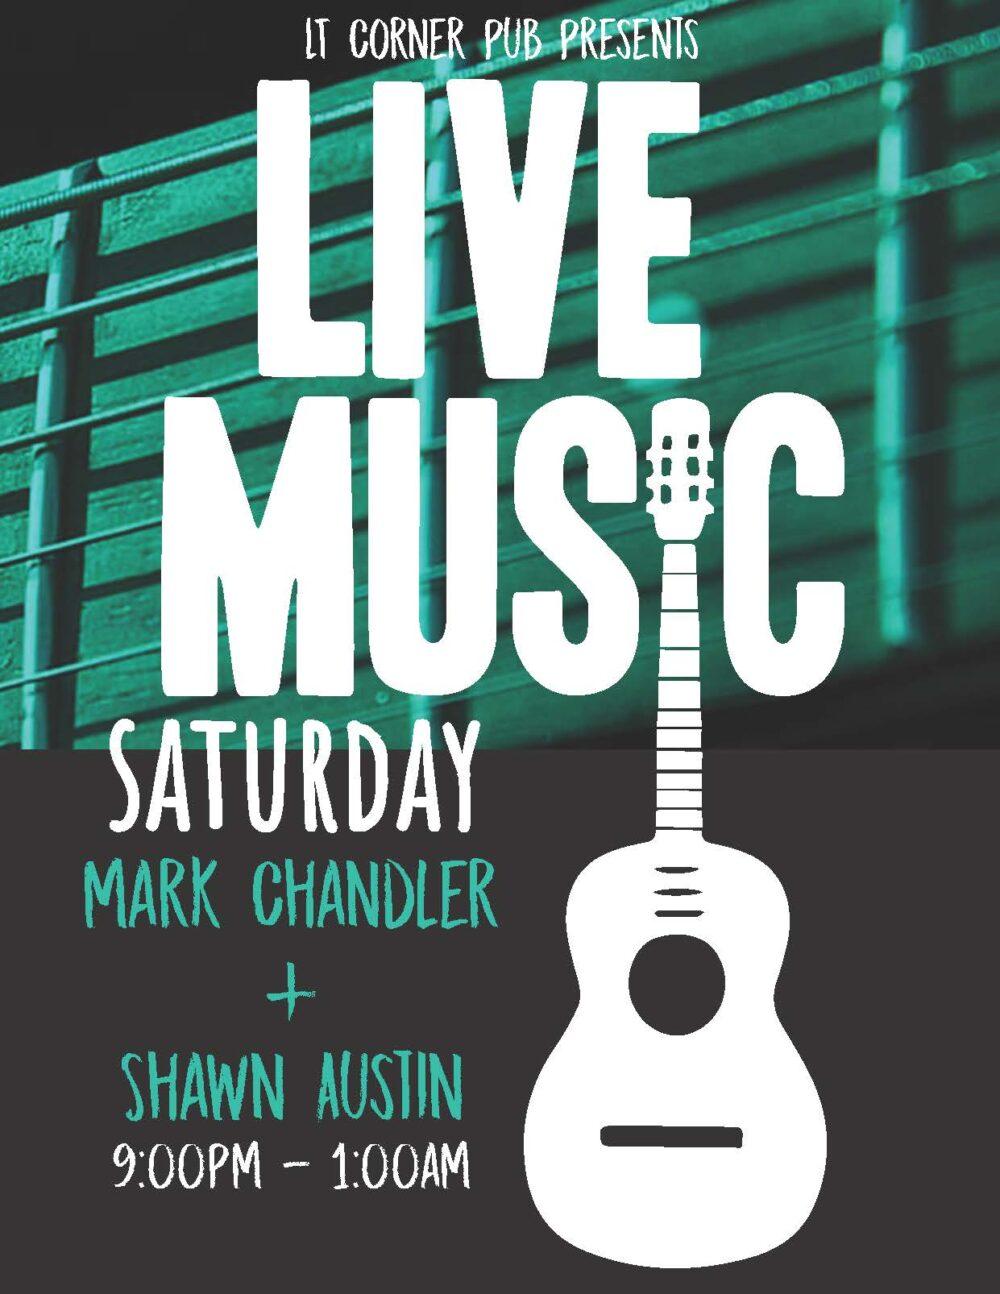 Live Music Saturday with Mark Chandler & Shawn Austin